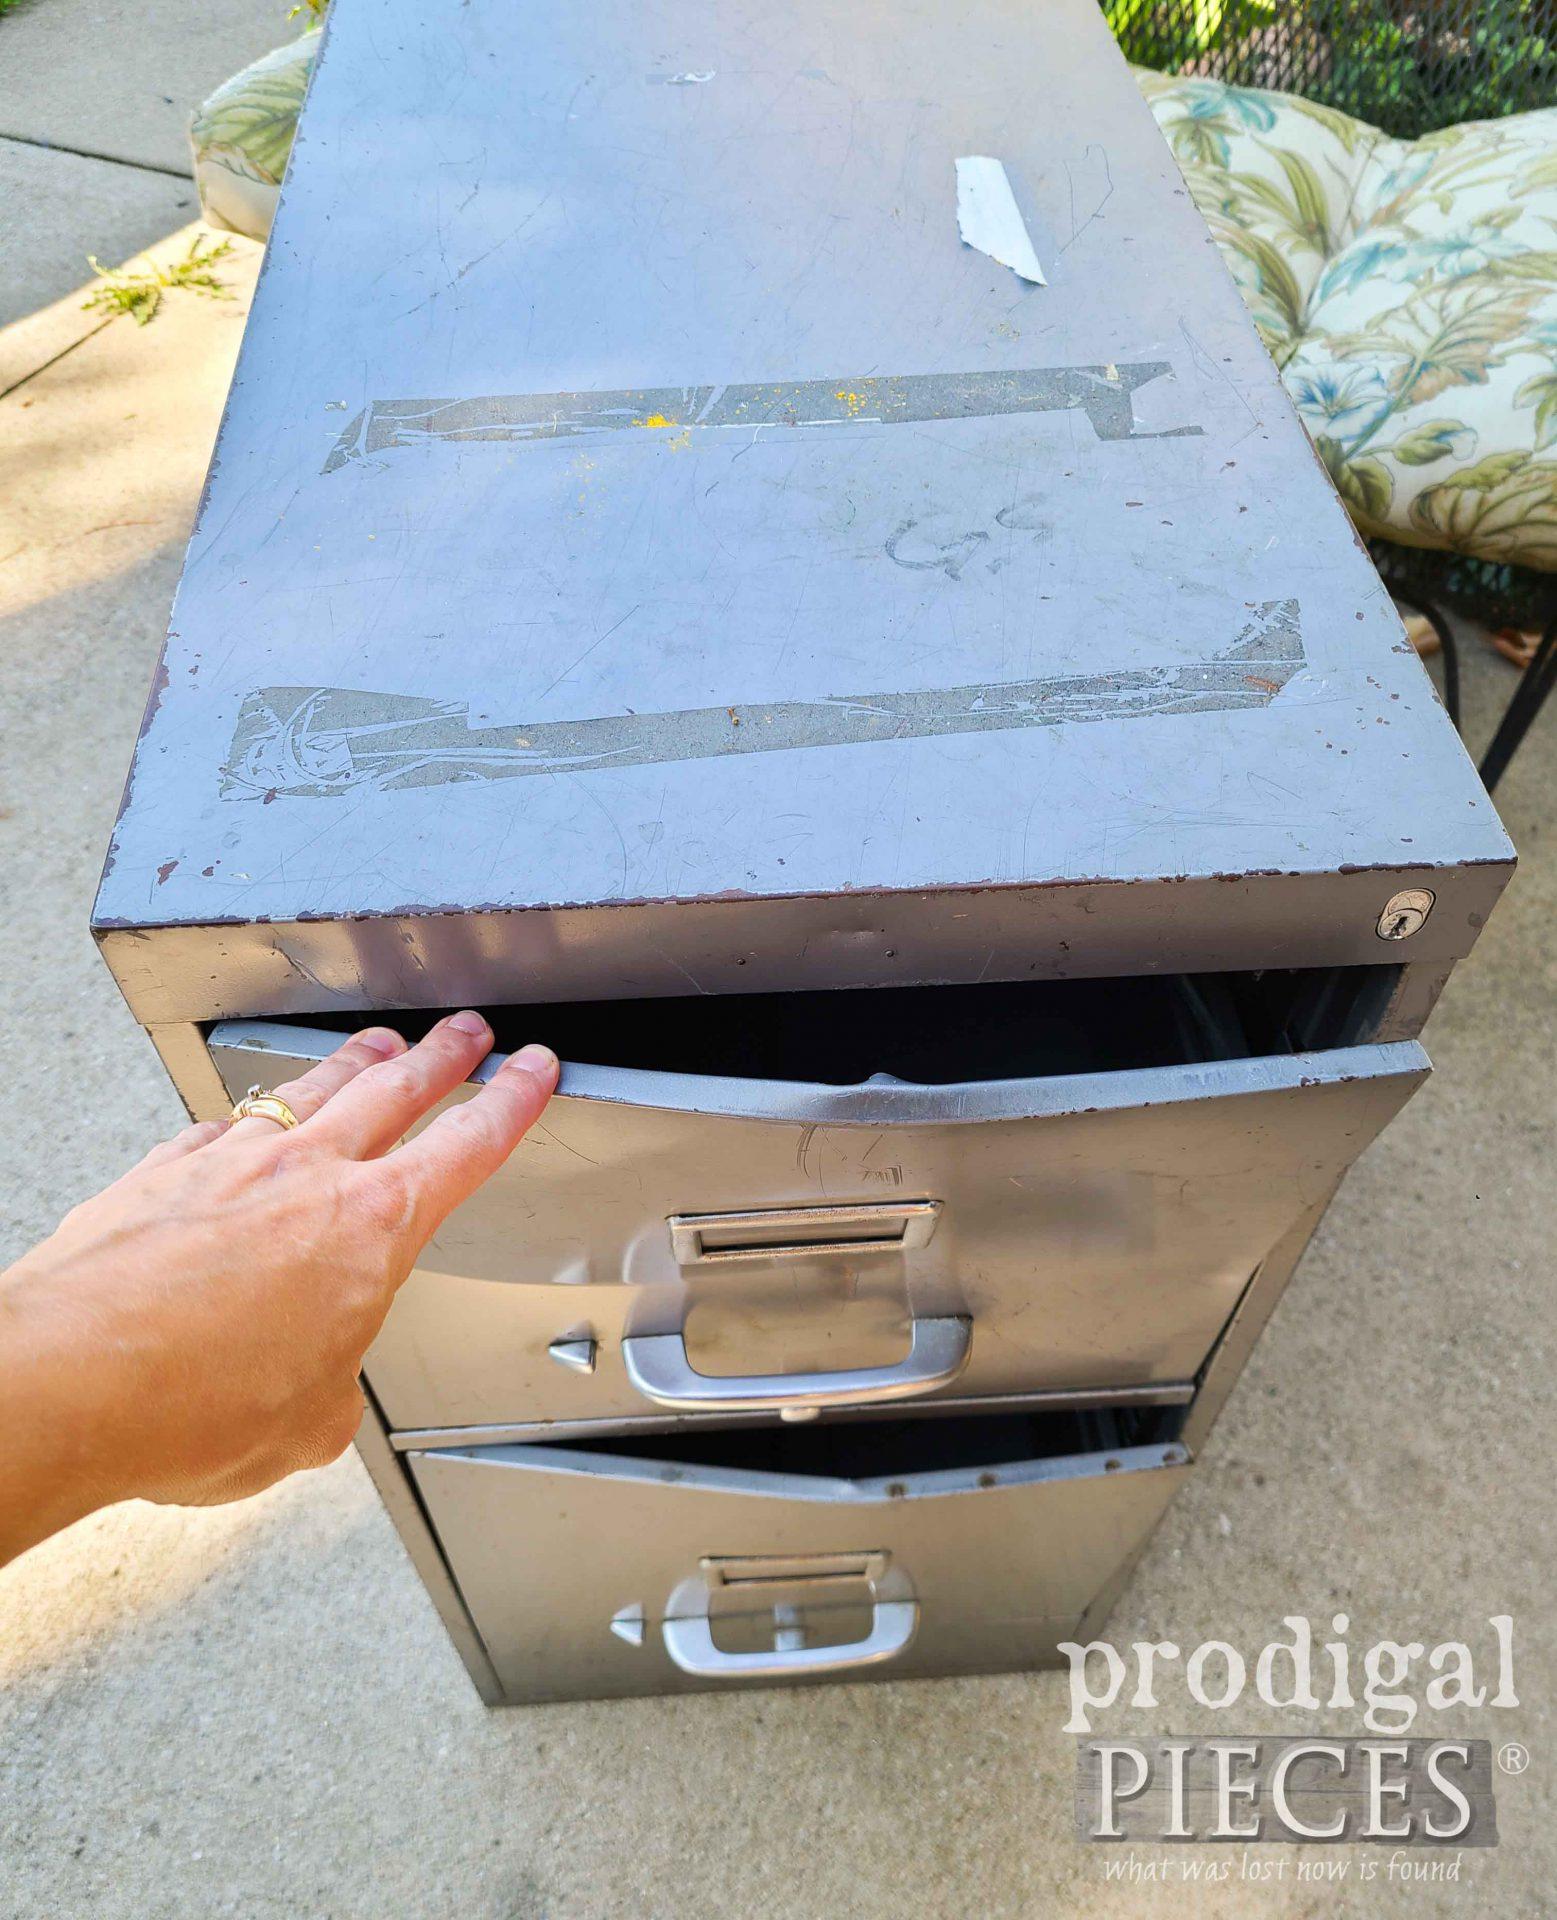 Damaged File Drawers on Upcycled Filing Cabinet   prodigalpieces.com